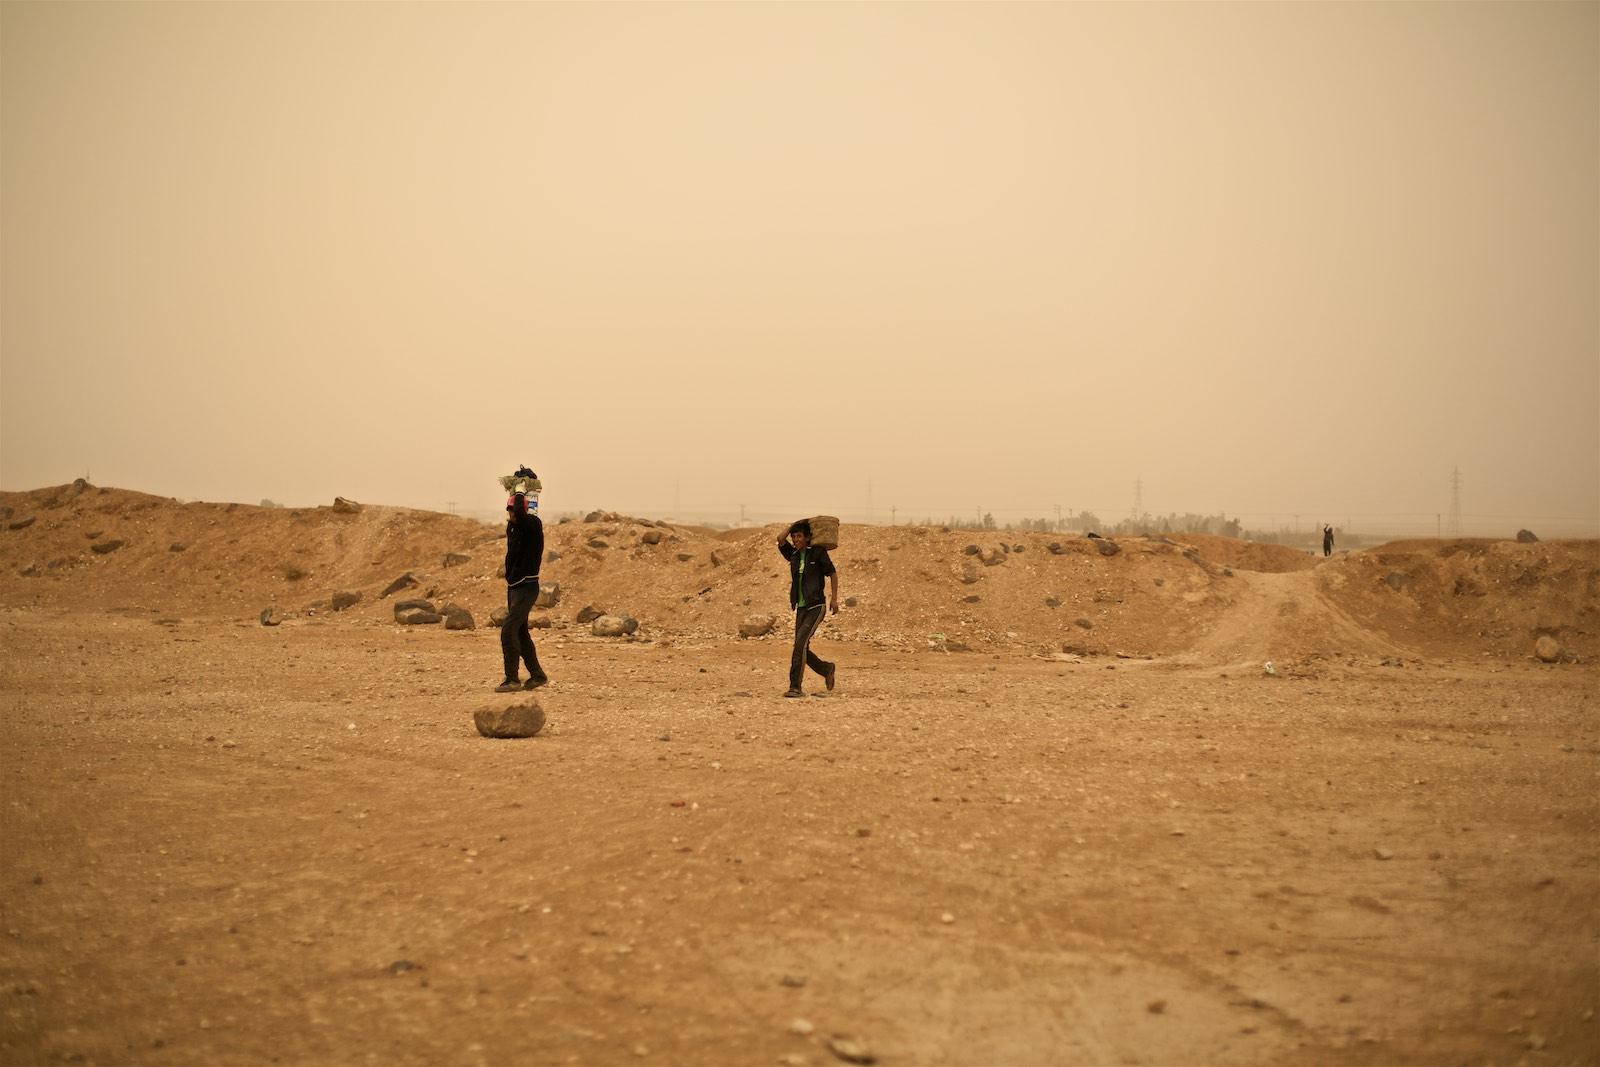 denis-bosnic-zaatari-jordan-refugee-camp-4.jpg